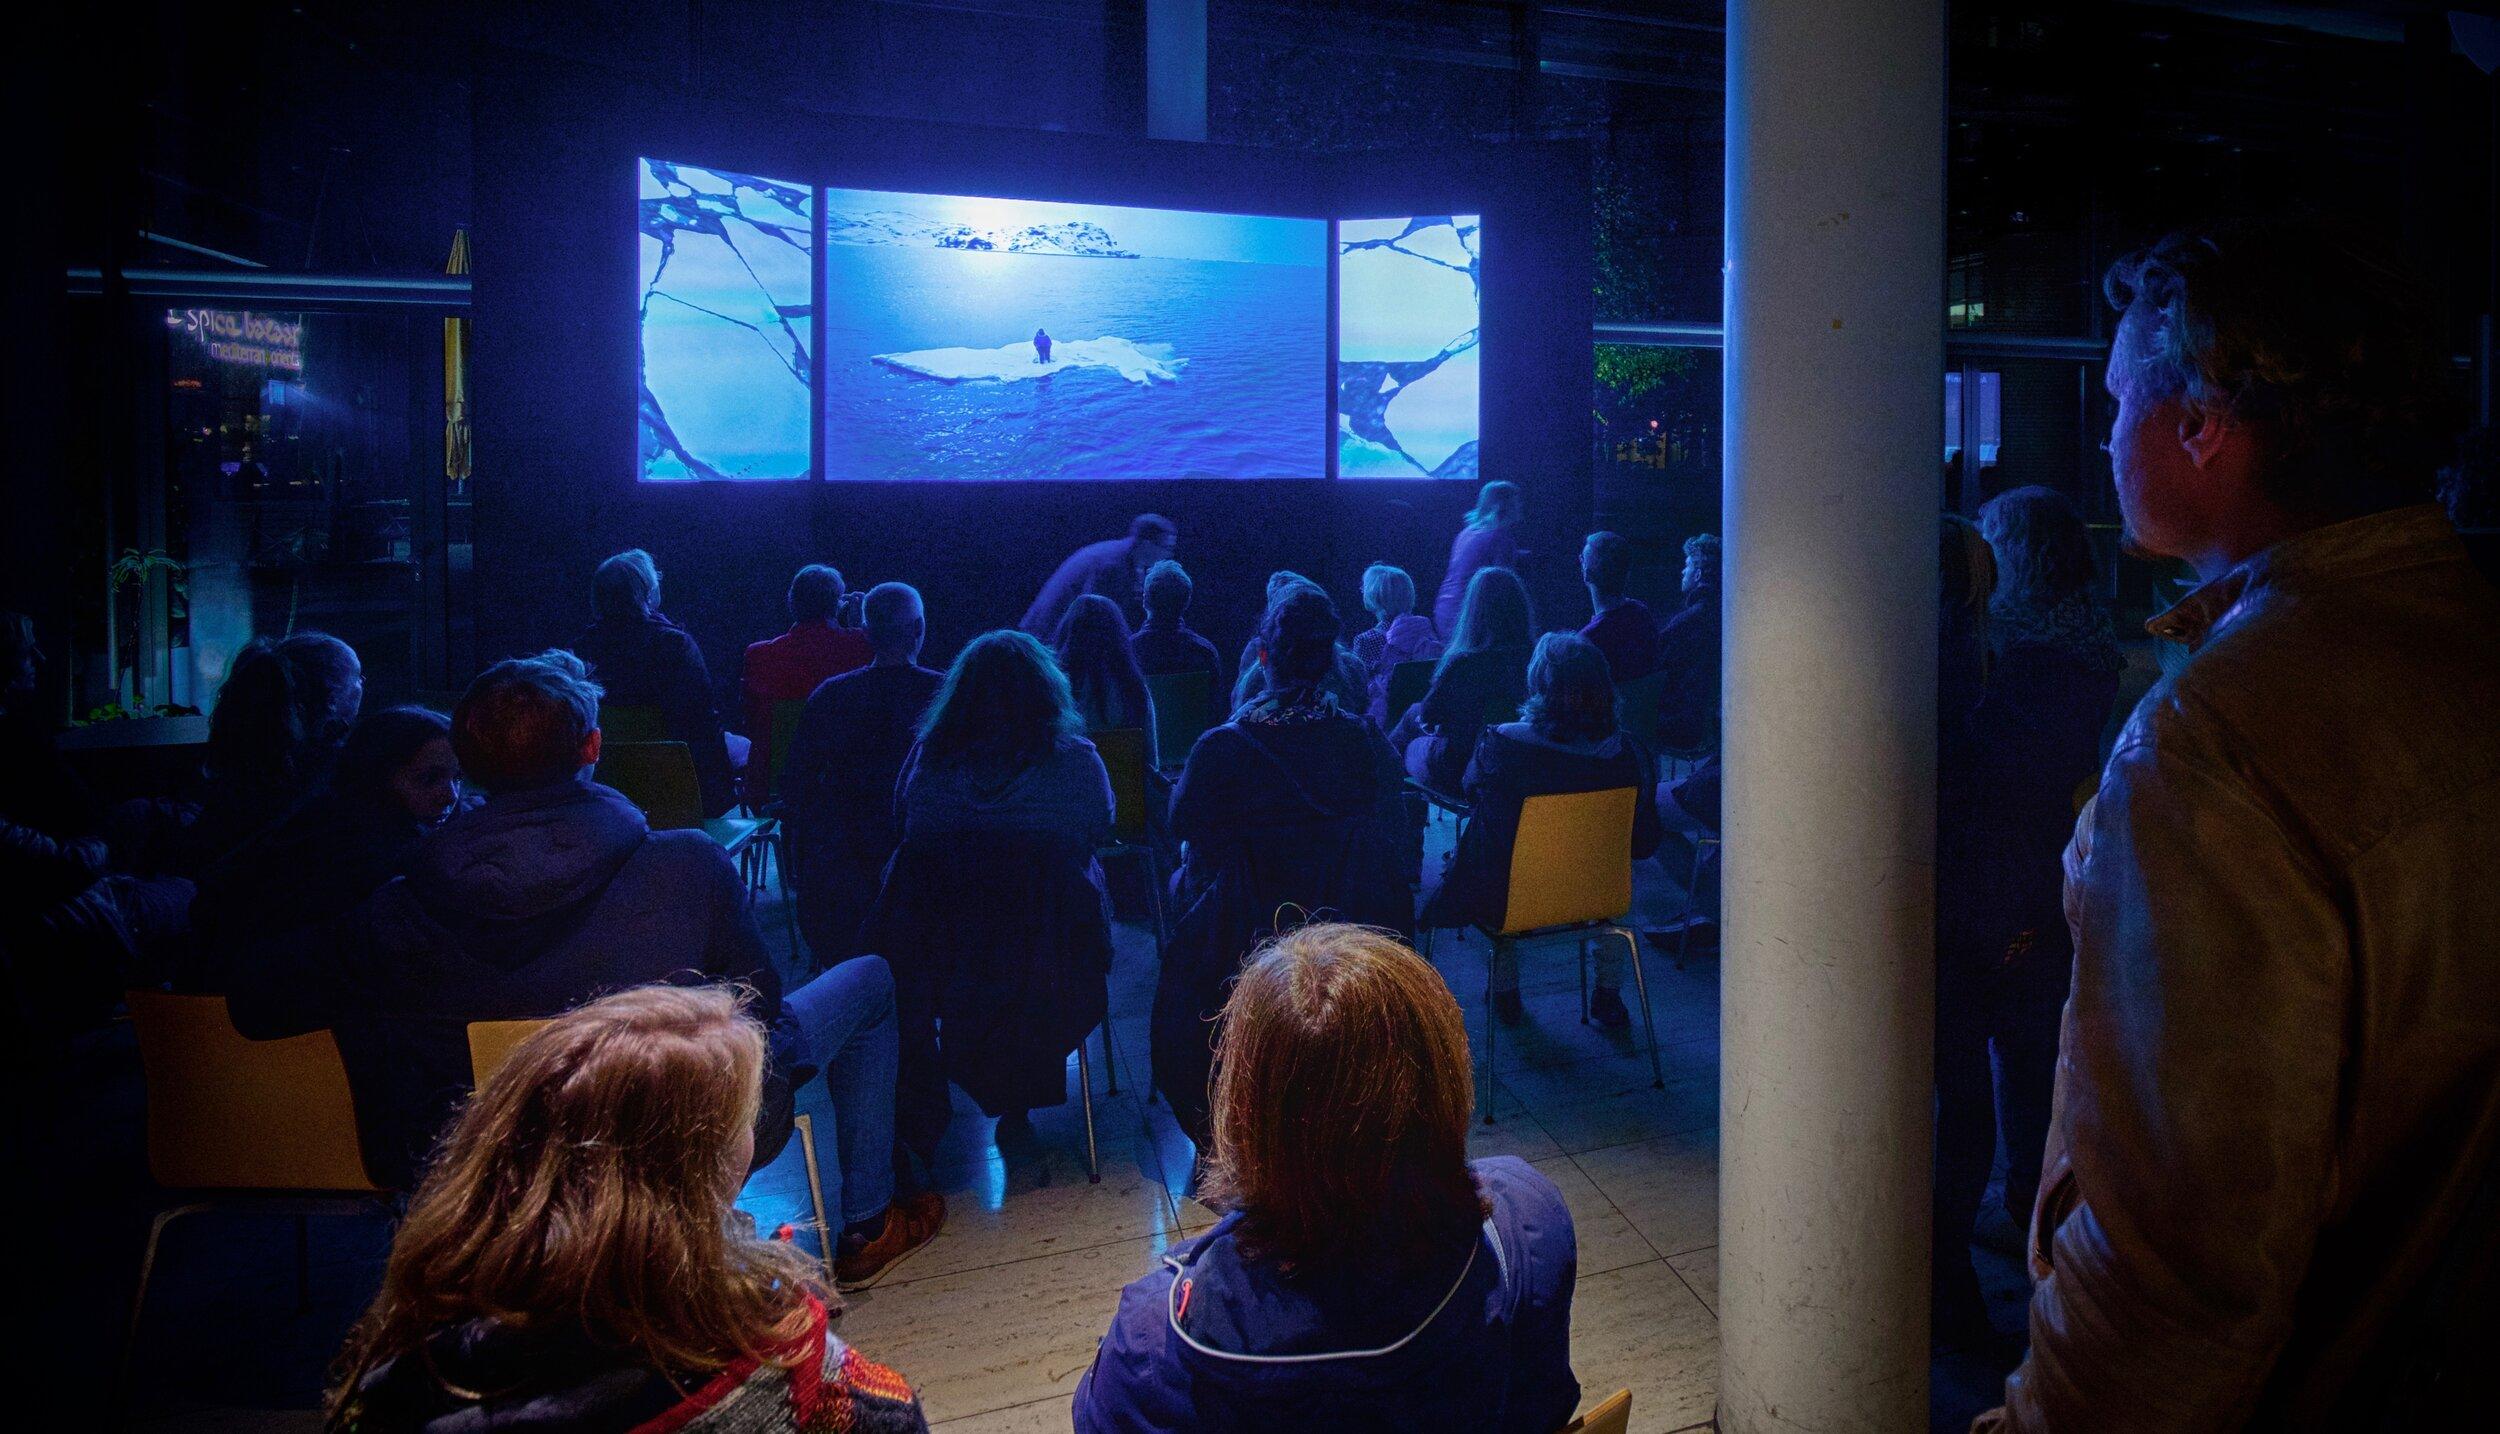 World première (sea ice video triptych) at Max Planck Institute, Munich, October 2019